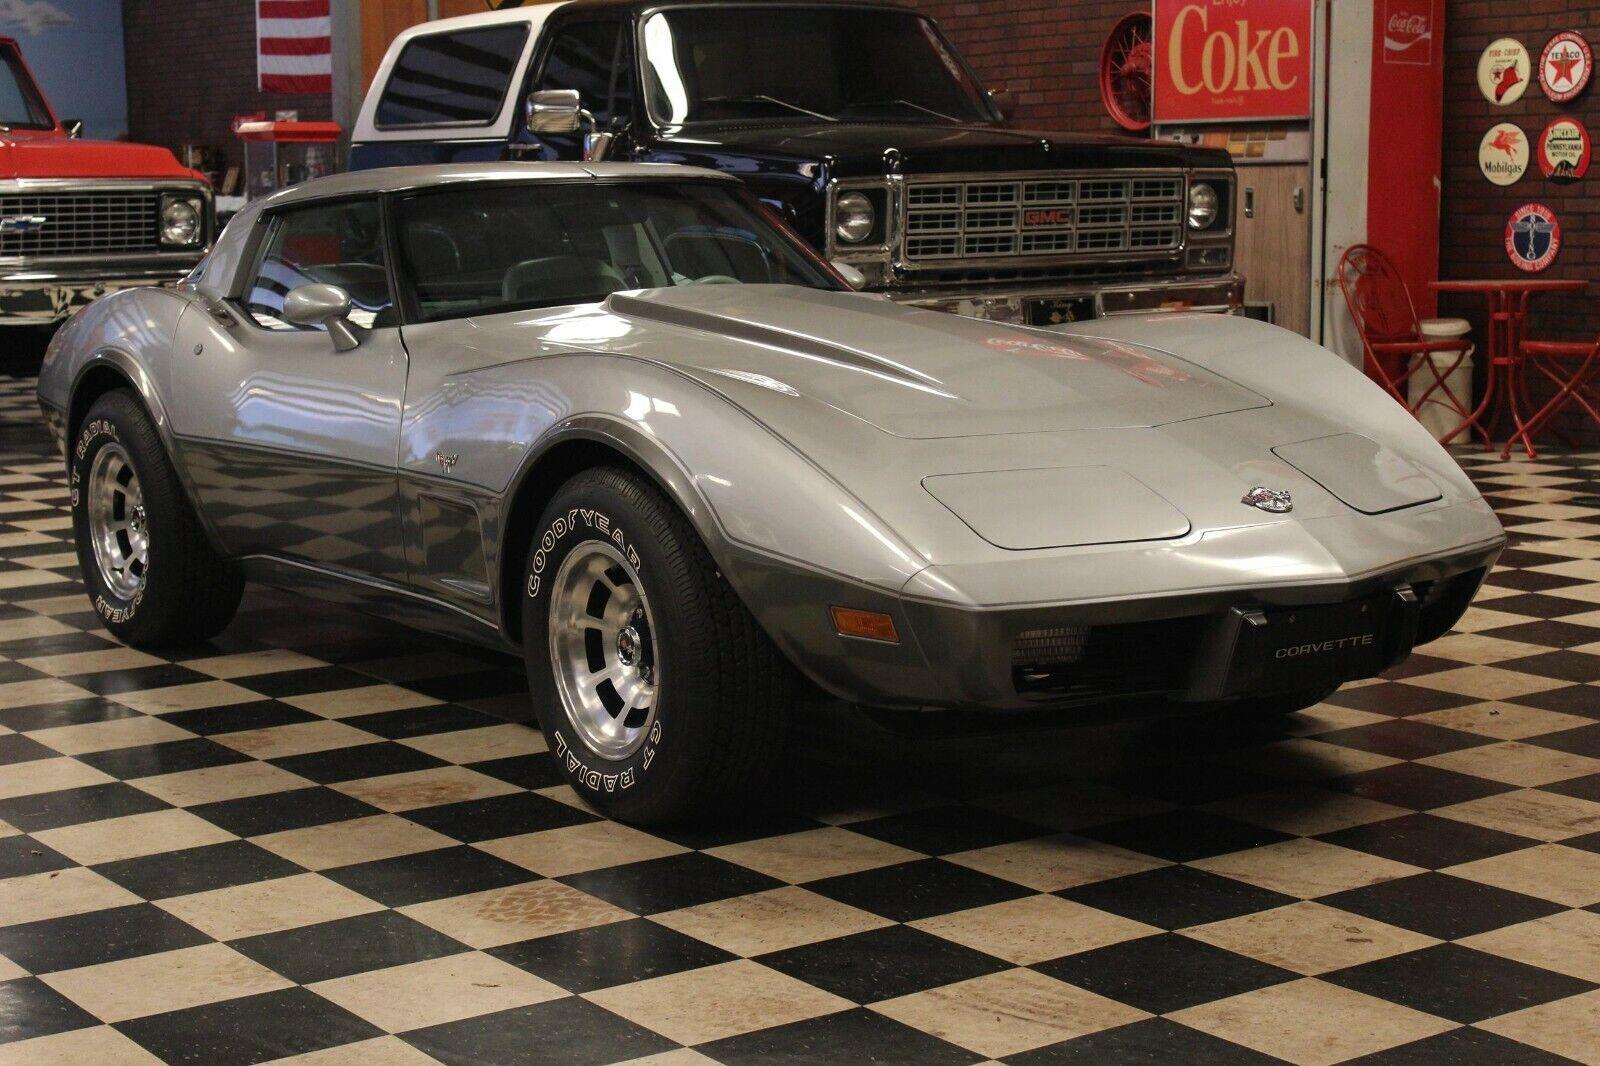 1978 Silver Chevrolet Corvette   | C3 Corvette Photo 1